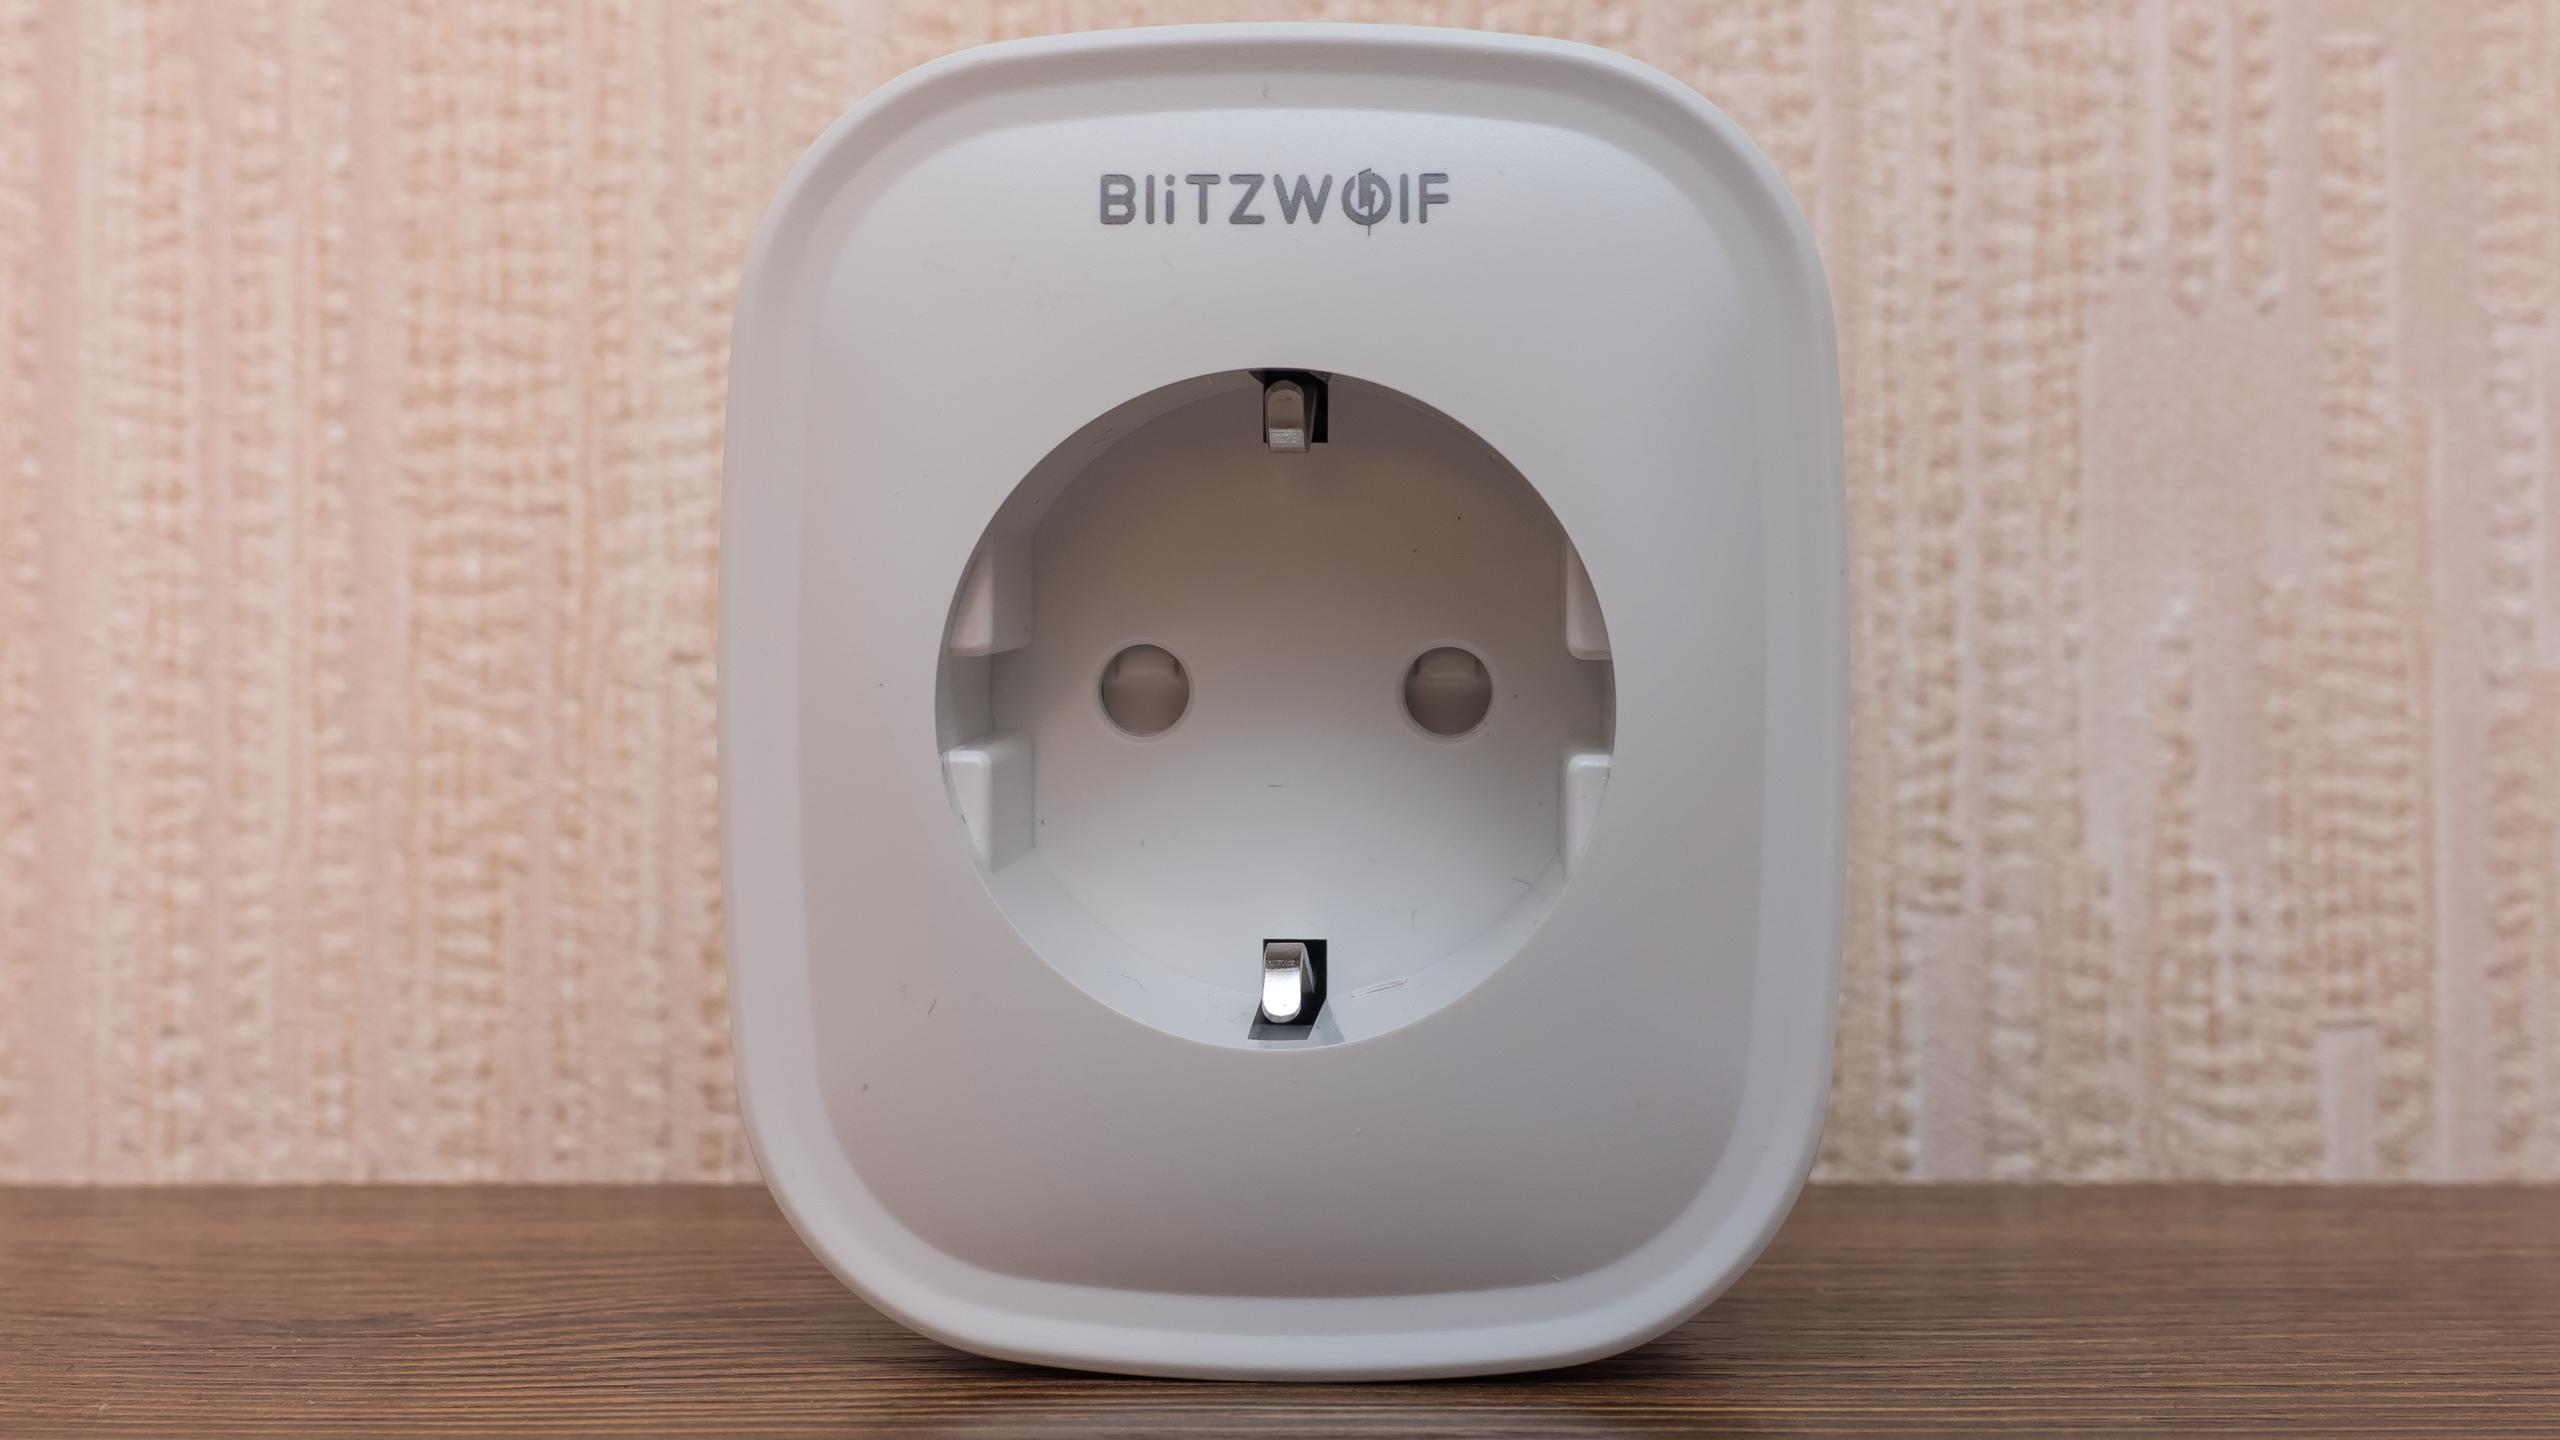 Wi-Fi-розетка BlitzWolf BW-SHP2 с энергомониторингом: обзор